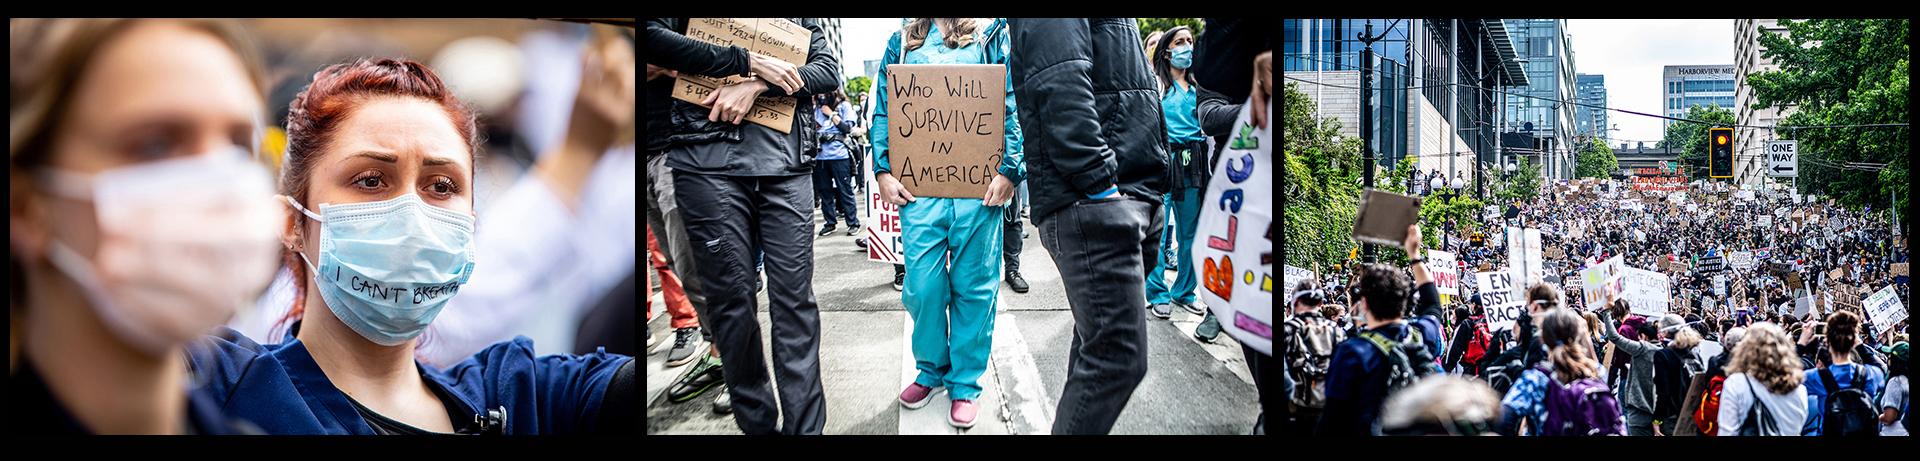 Health care march photos